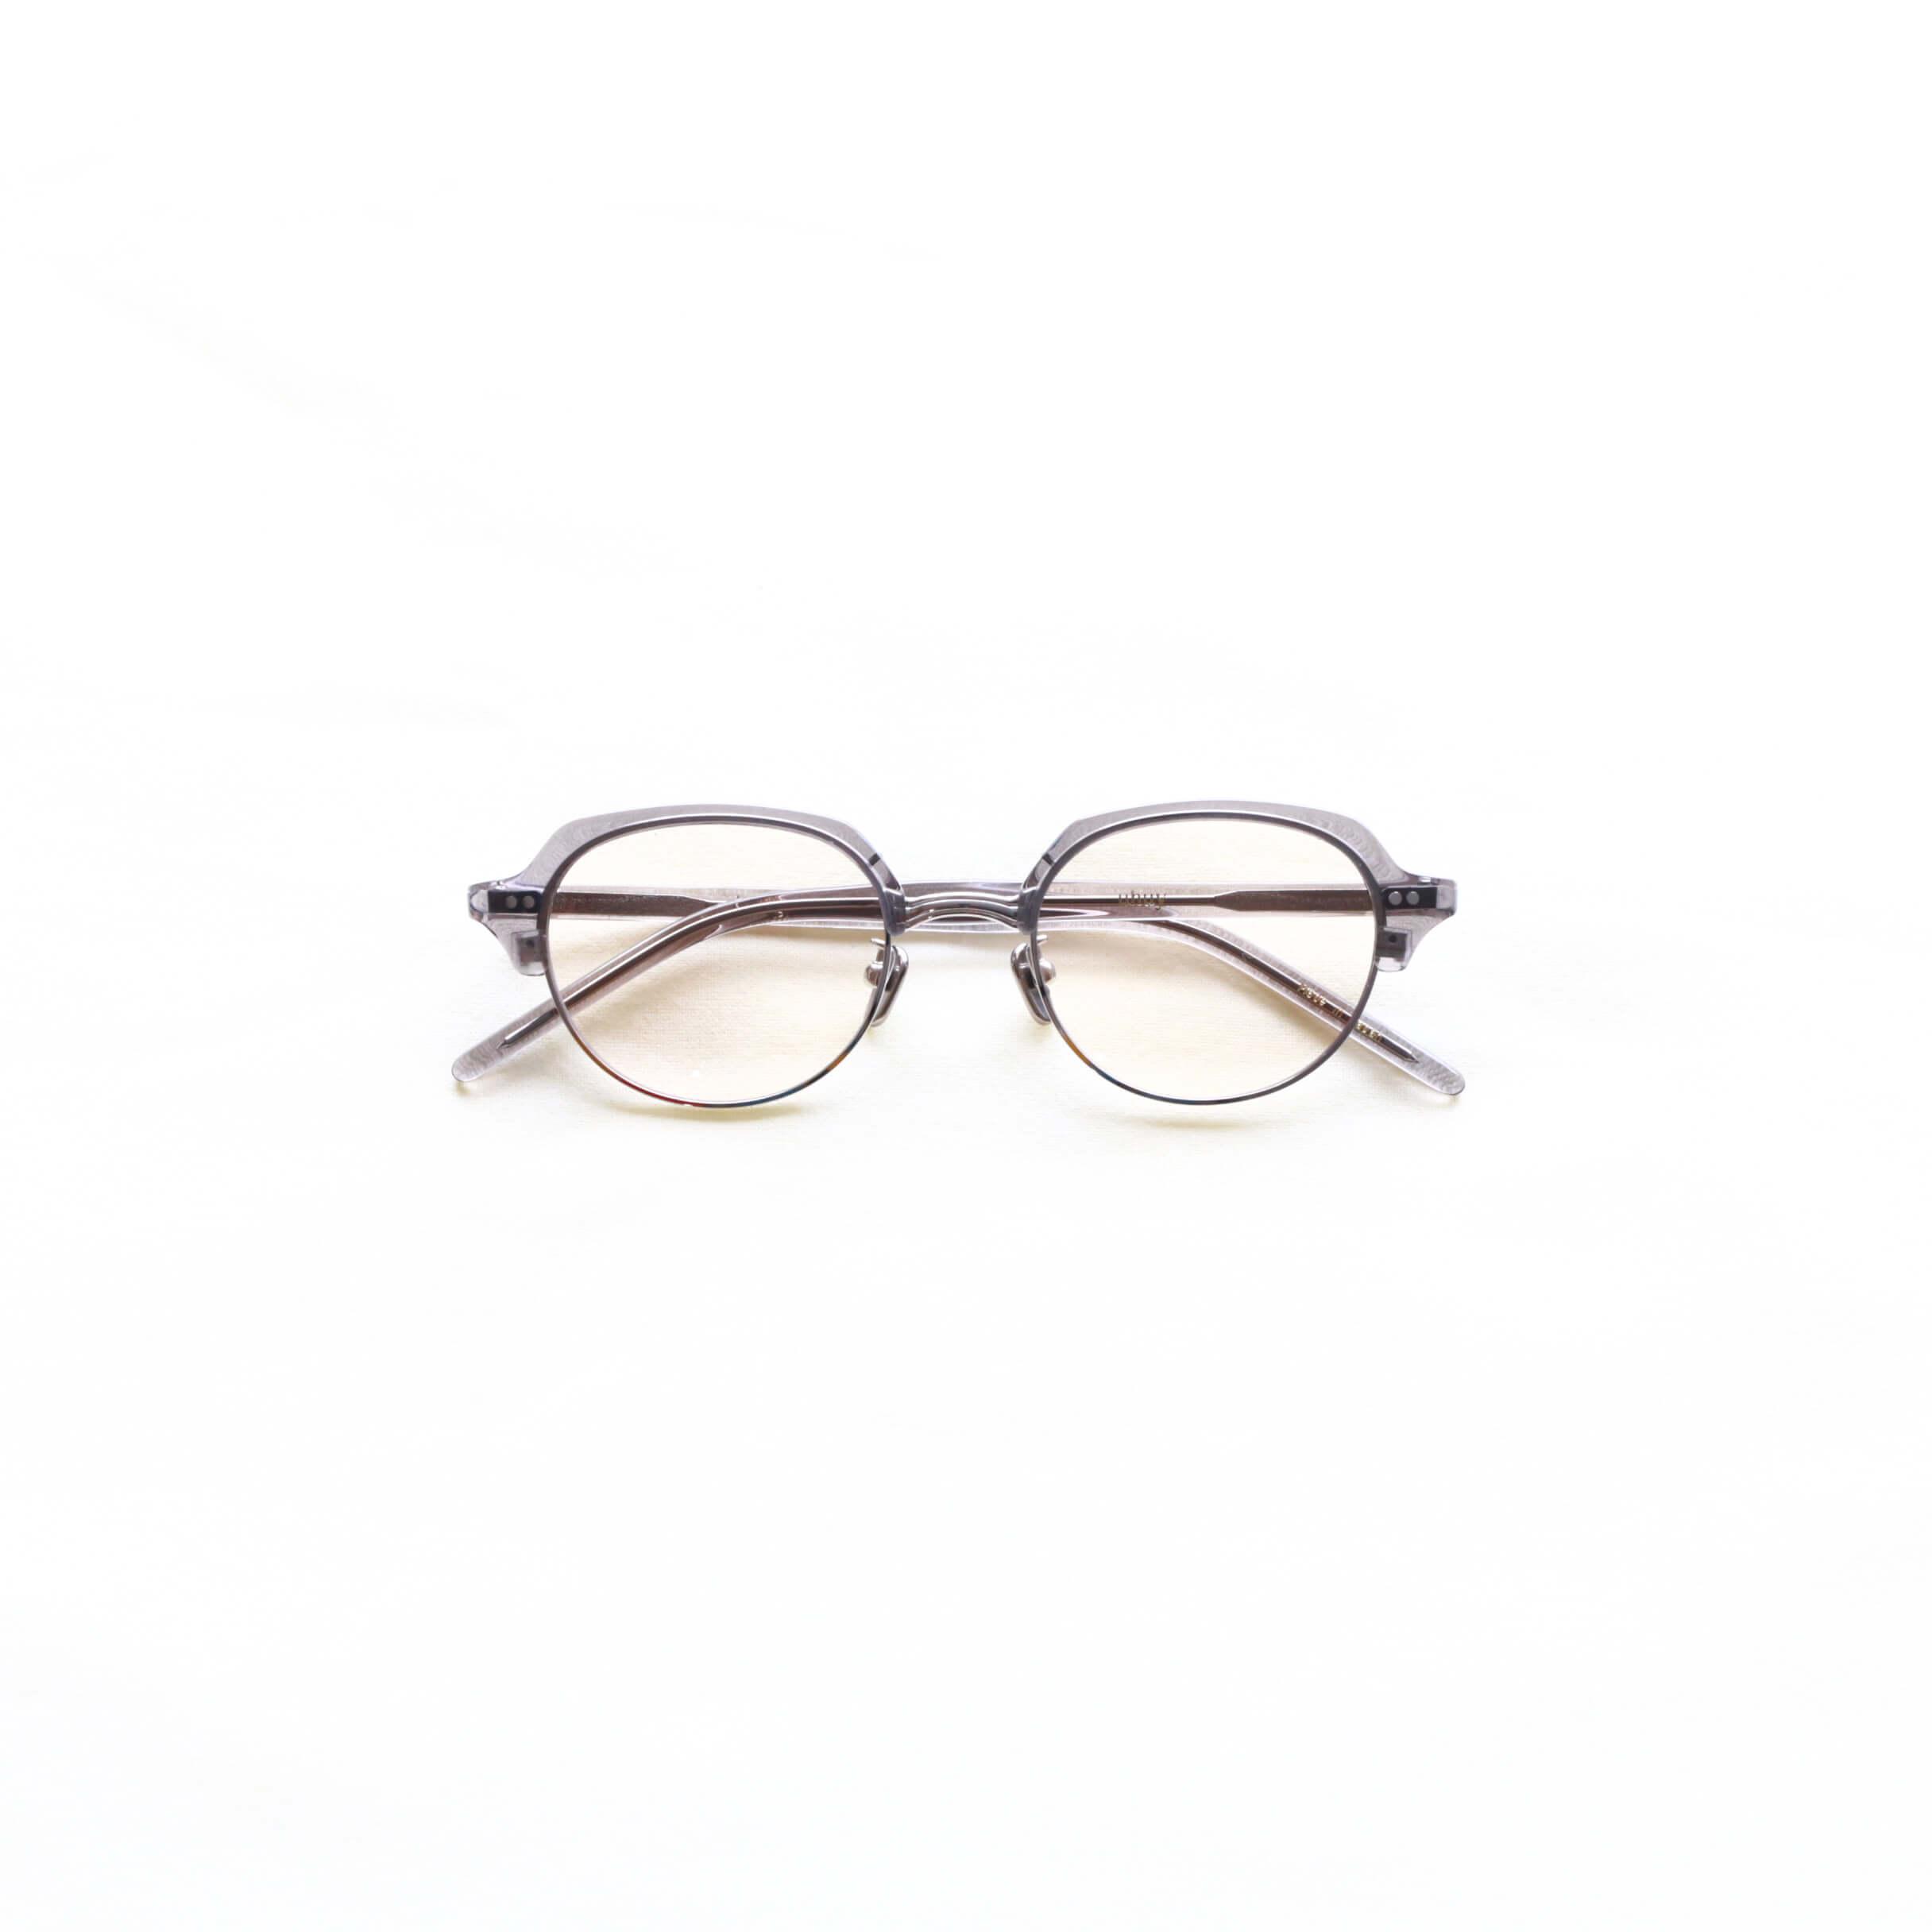 kearny カーニー uhuy ウフュイ セルロイド眼鏡